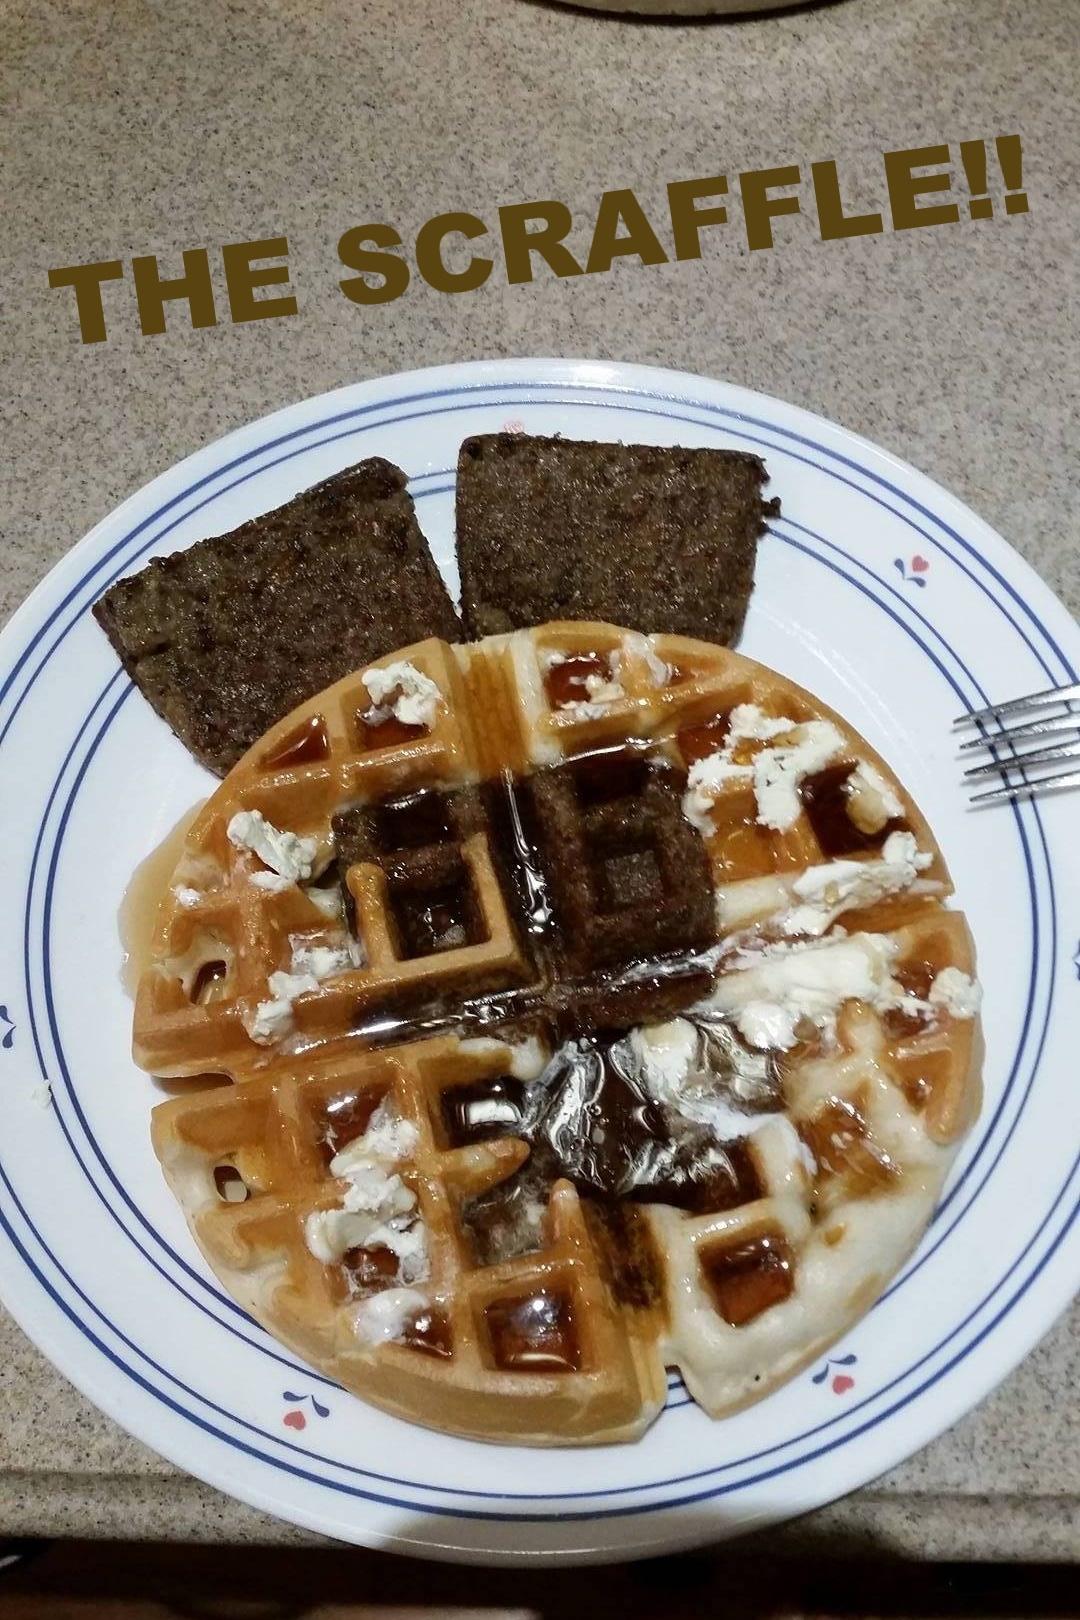 scraffle-on-a-plate-587163-edited.jpg